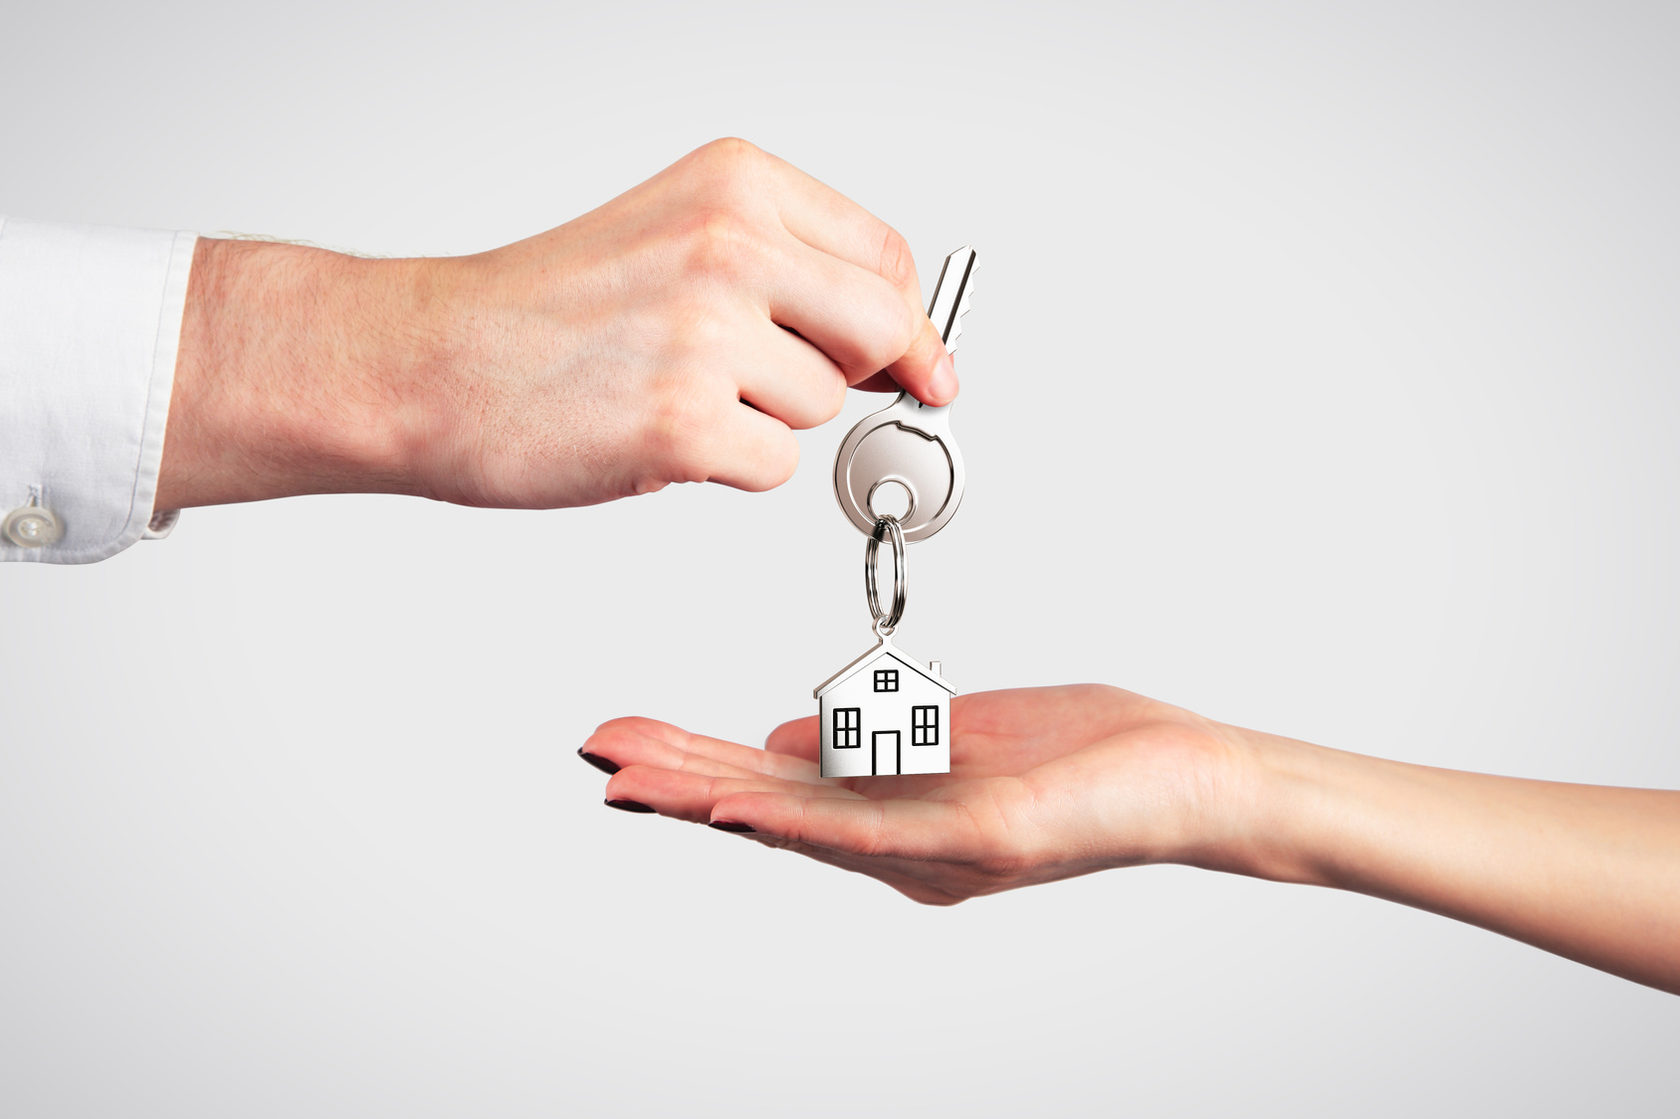 адвокат, адвокат запорожье, адвокат в запорожье, недвижимость, юрист, помощь юриста, долги